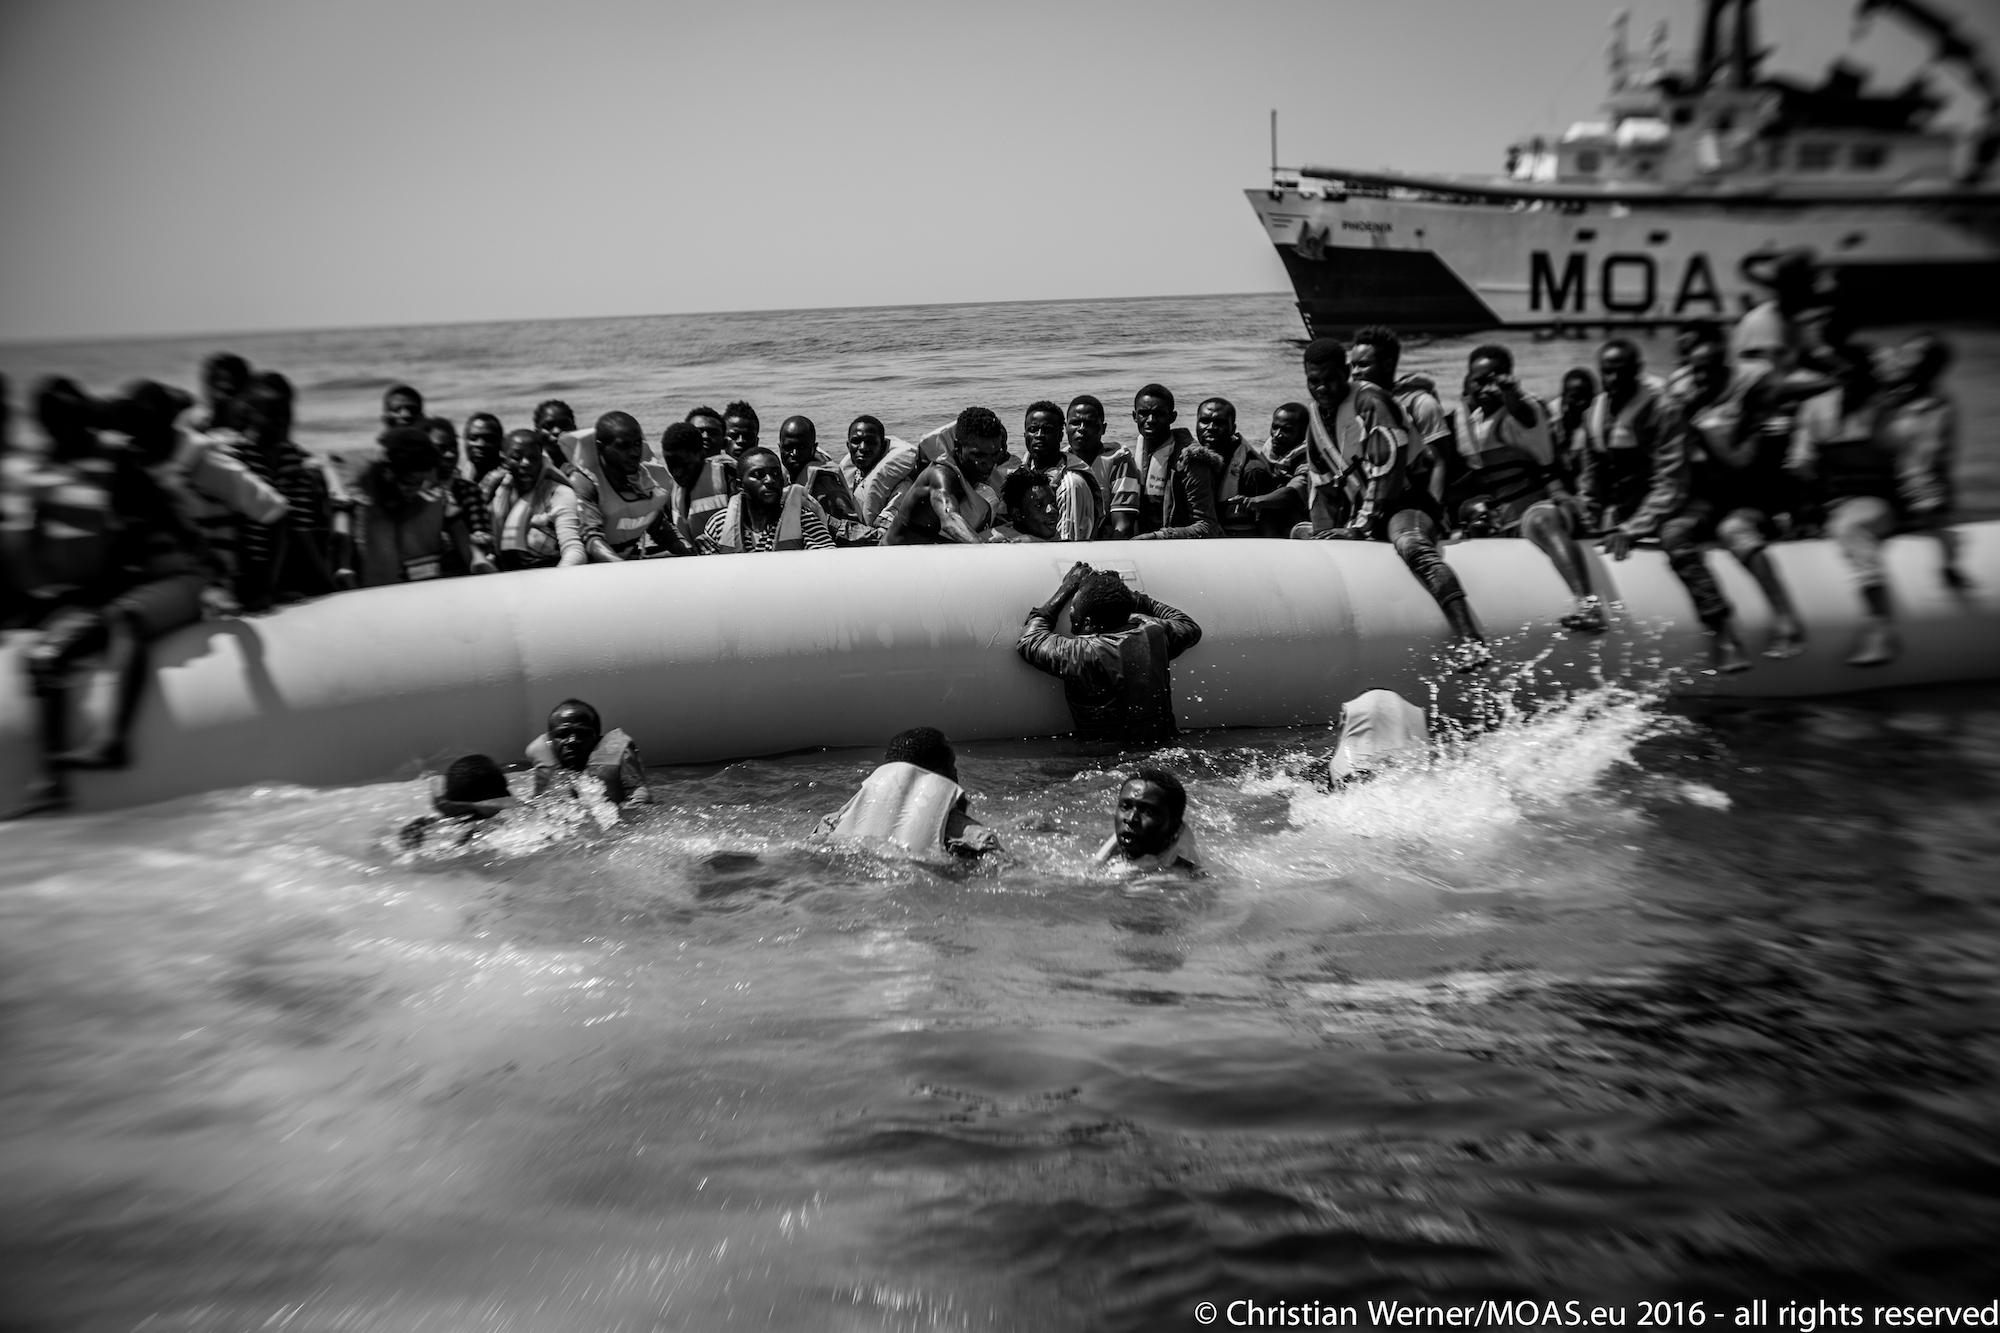 MOAS Rescue Operations near the libyan Coast.